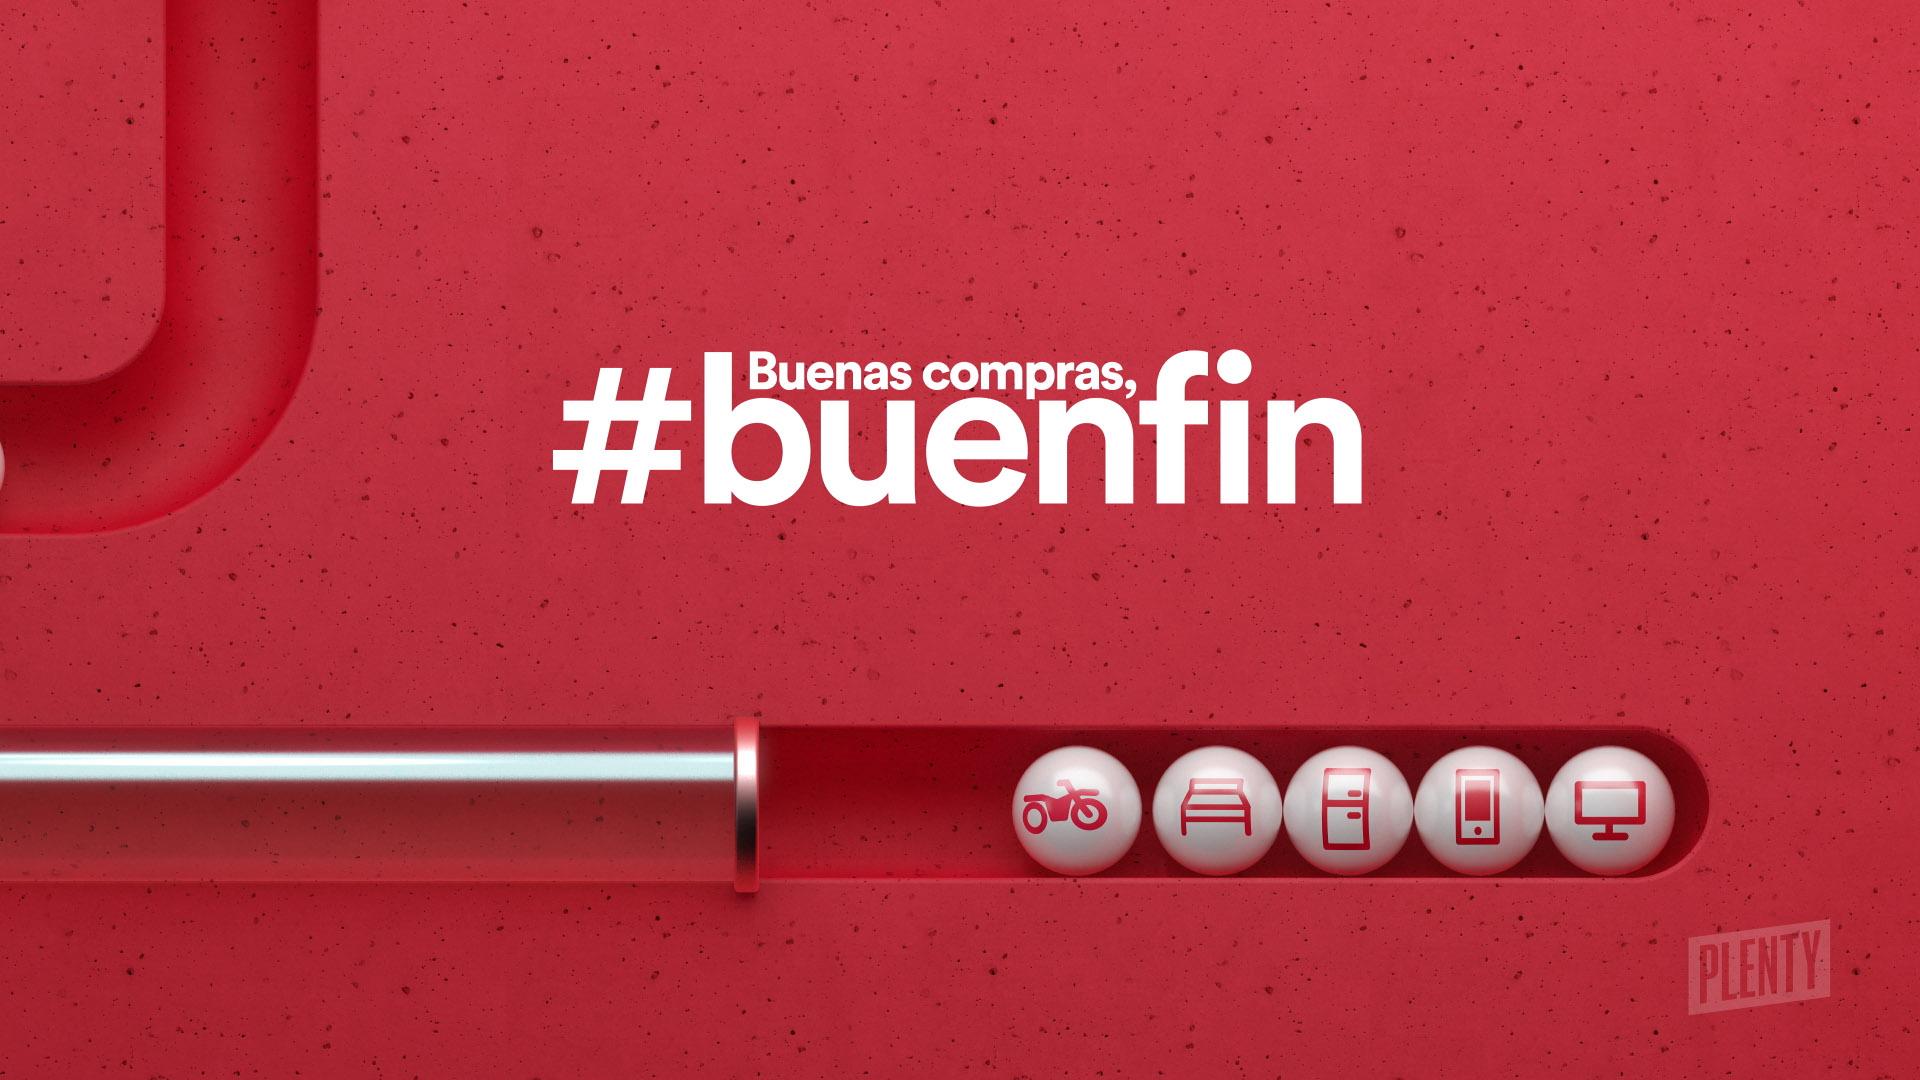 BuenFIn_7.jpg